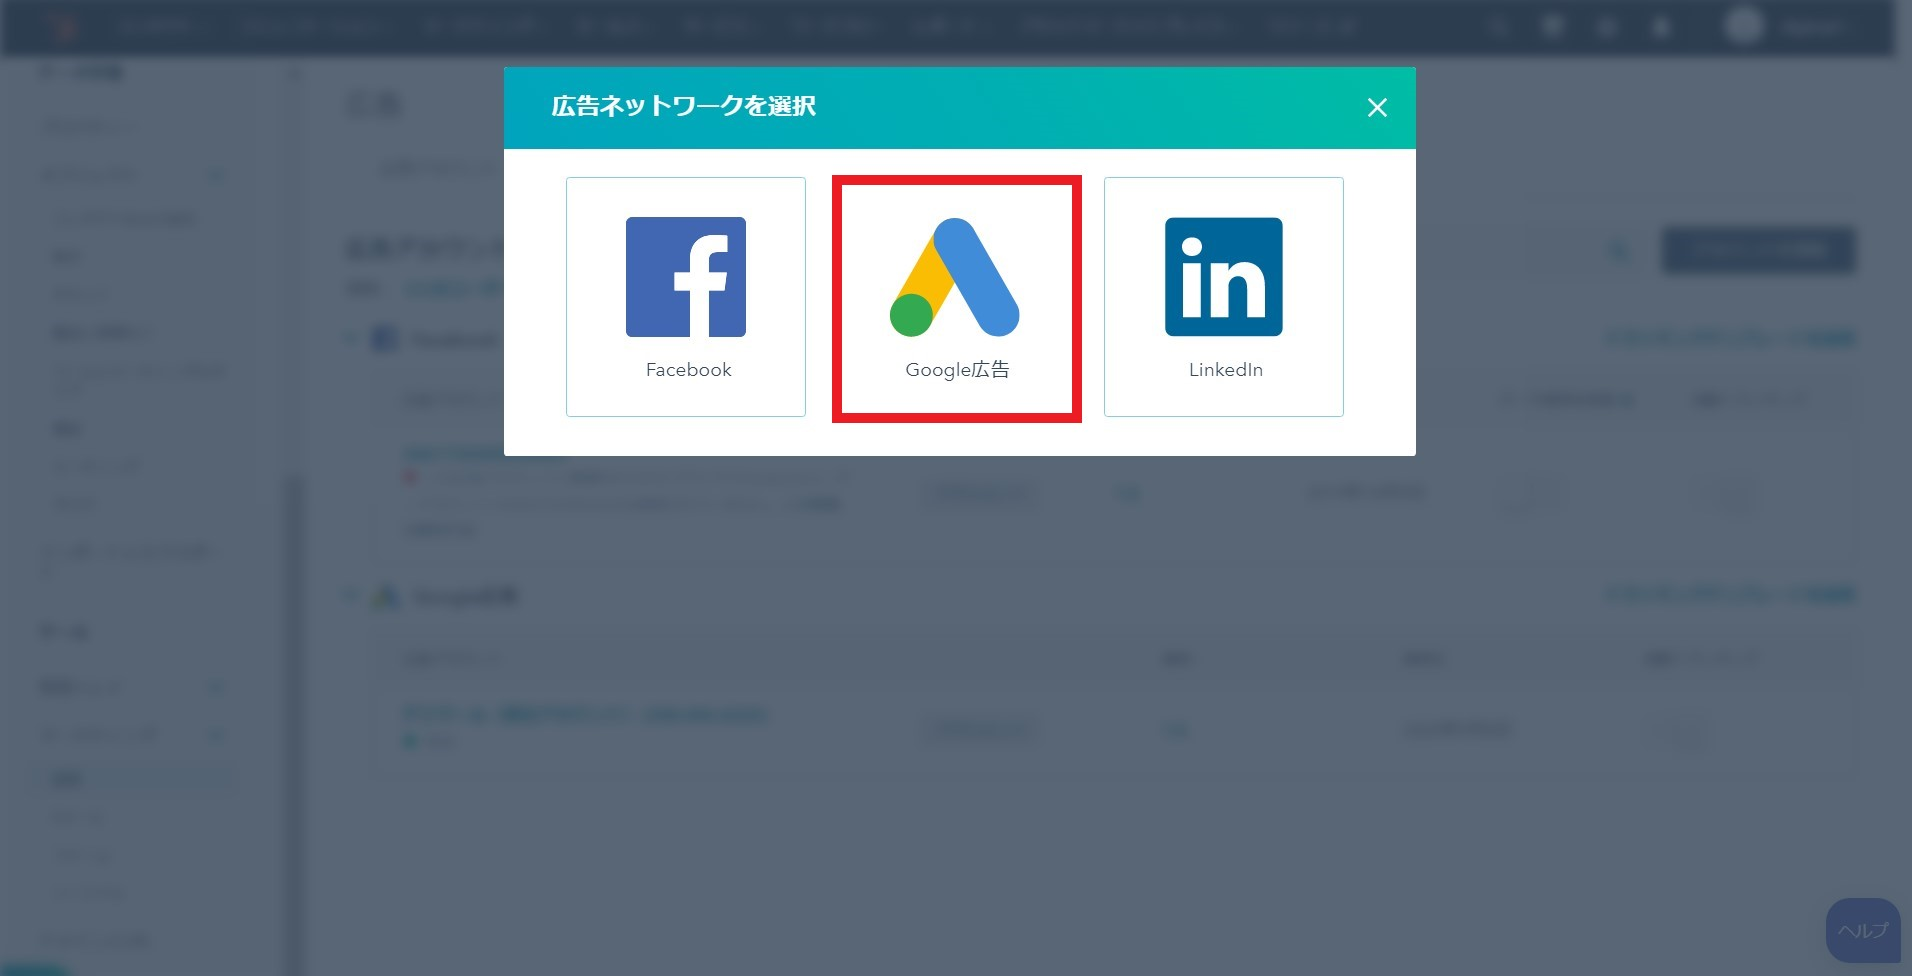 HubSpotで接続する広告ネットワークを選択